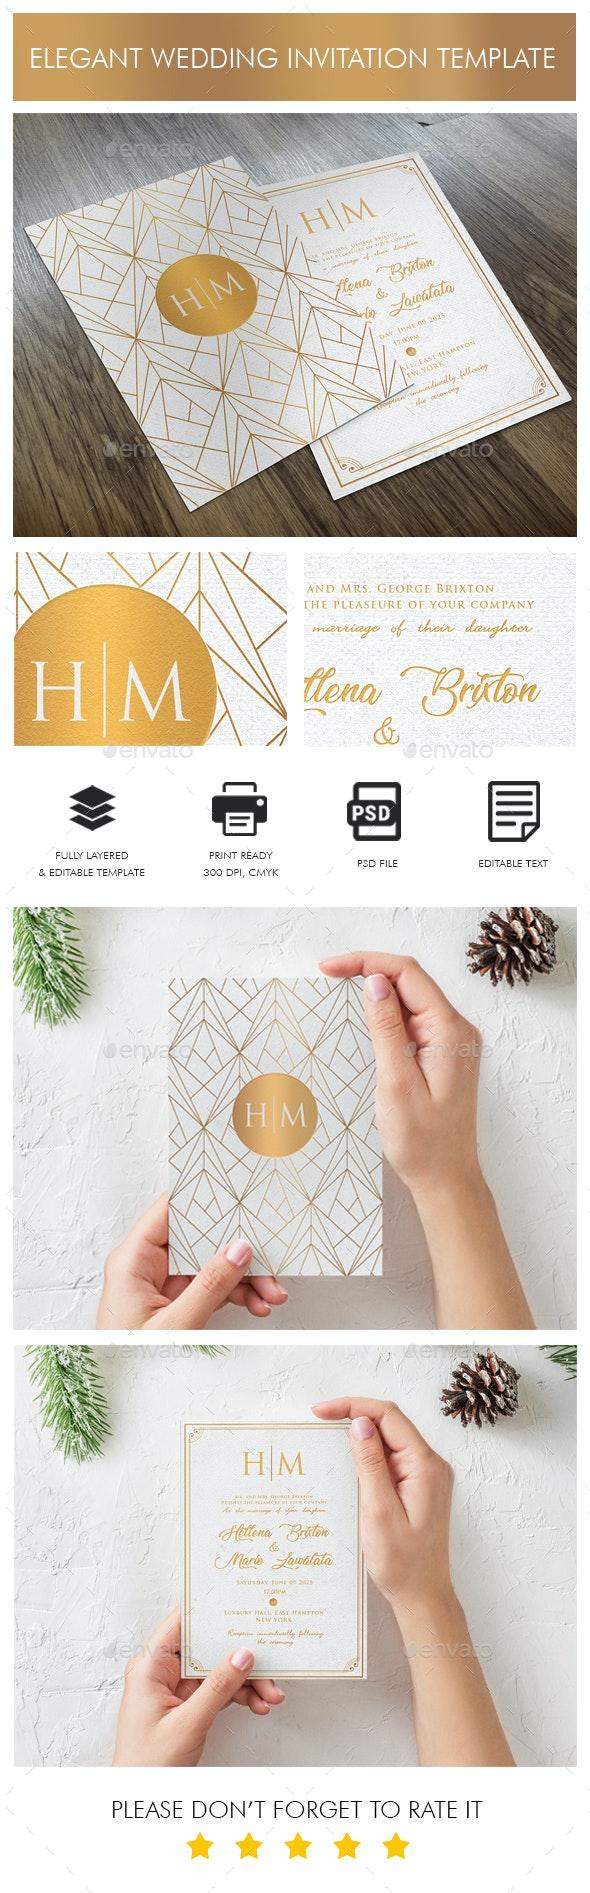 Elegant Wedding Invitation Template - Wedding Greeting Cards